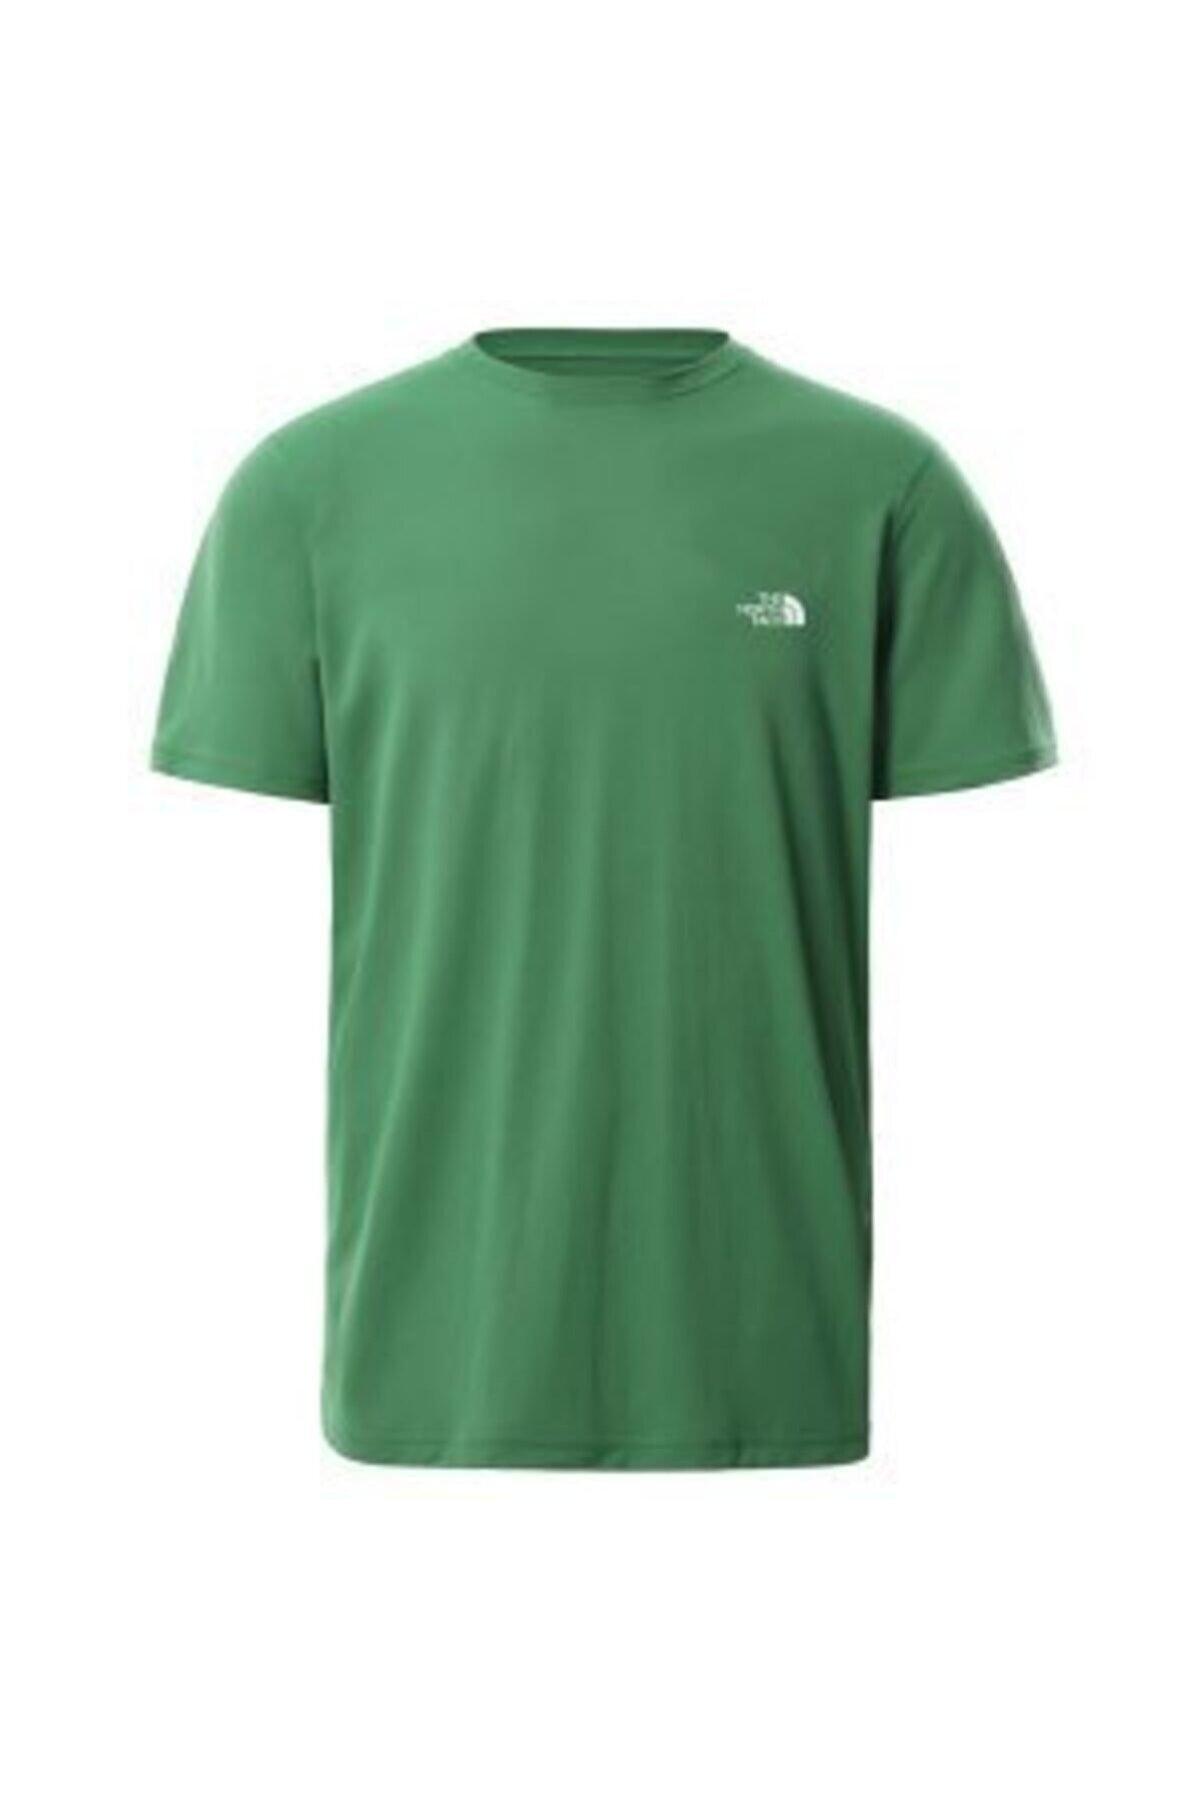 The North Face M New Basic Left Chest Logo Tee - Eu Erkek Yeşil Tshirt Nf0a55axeu21